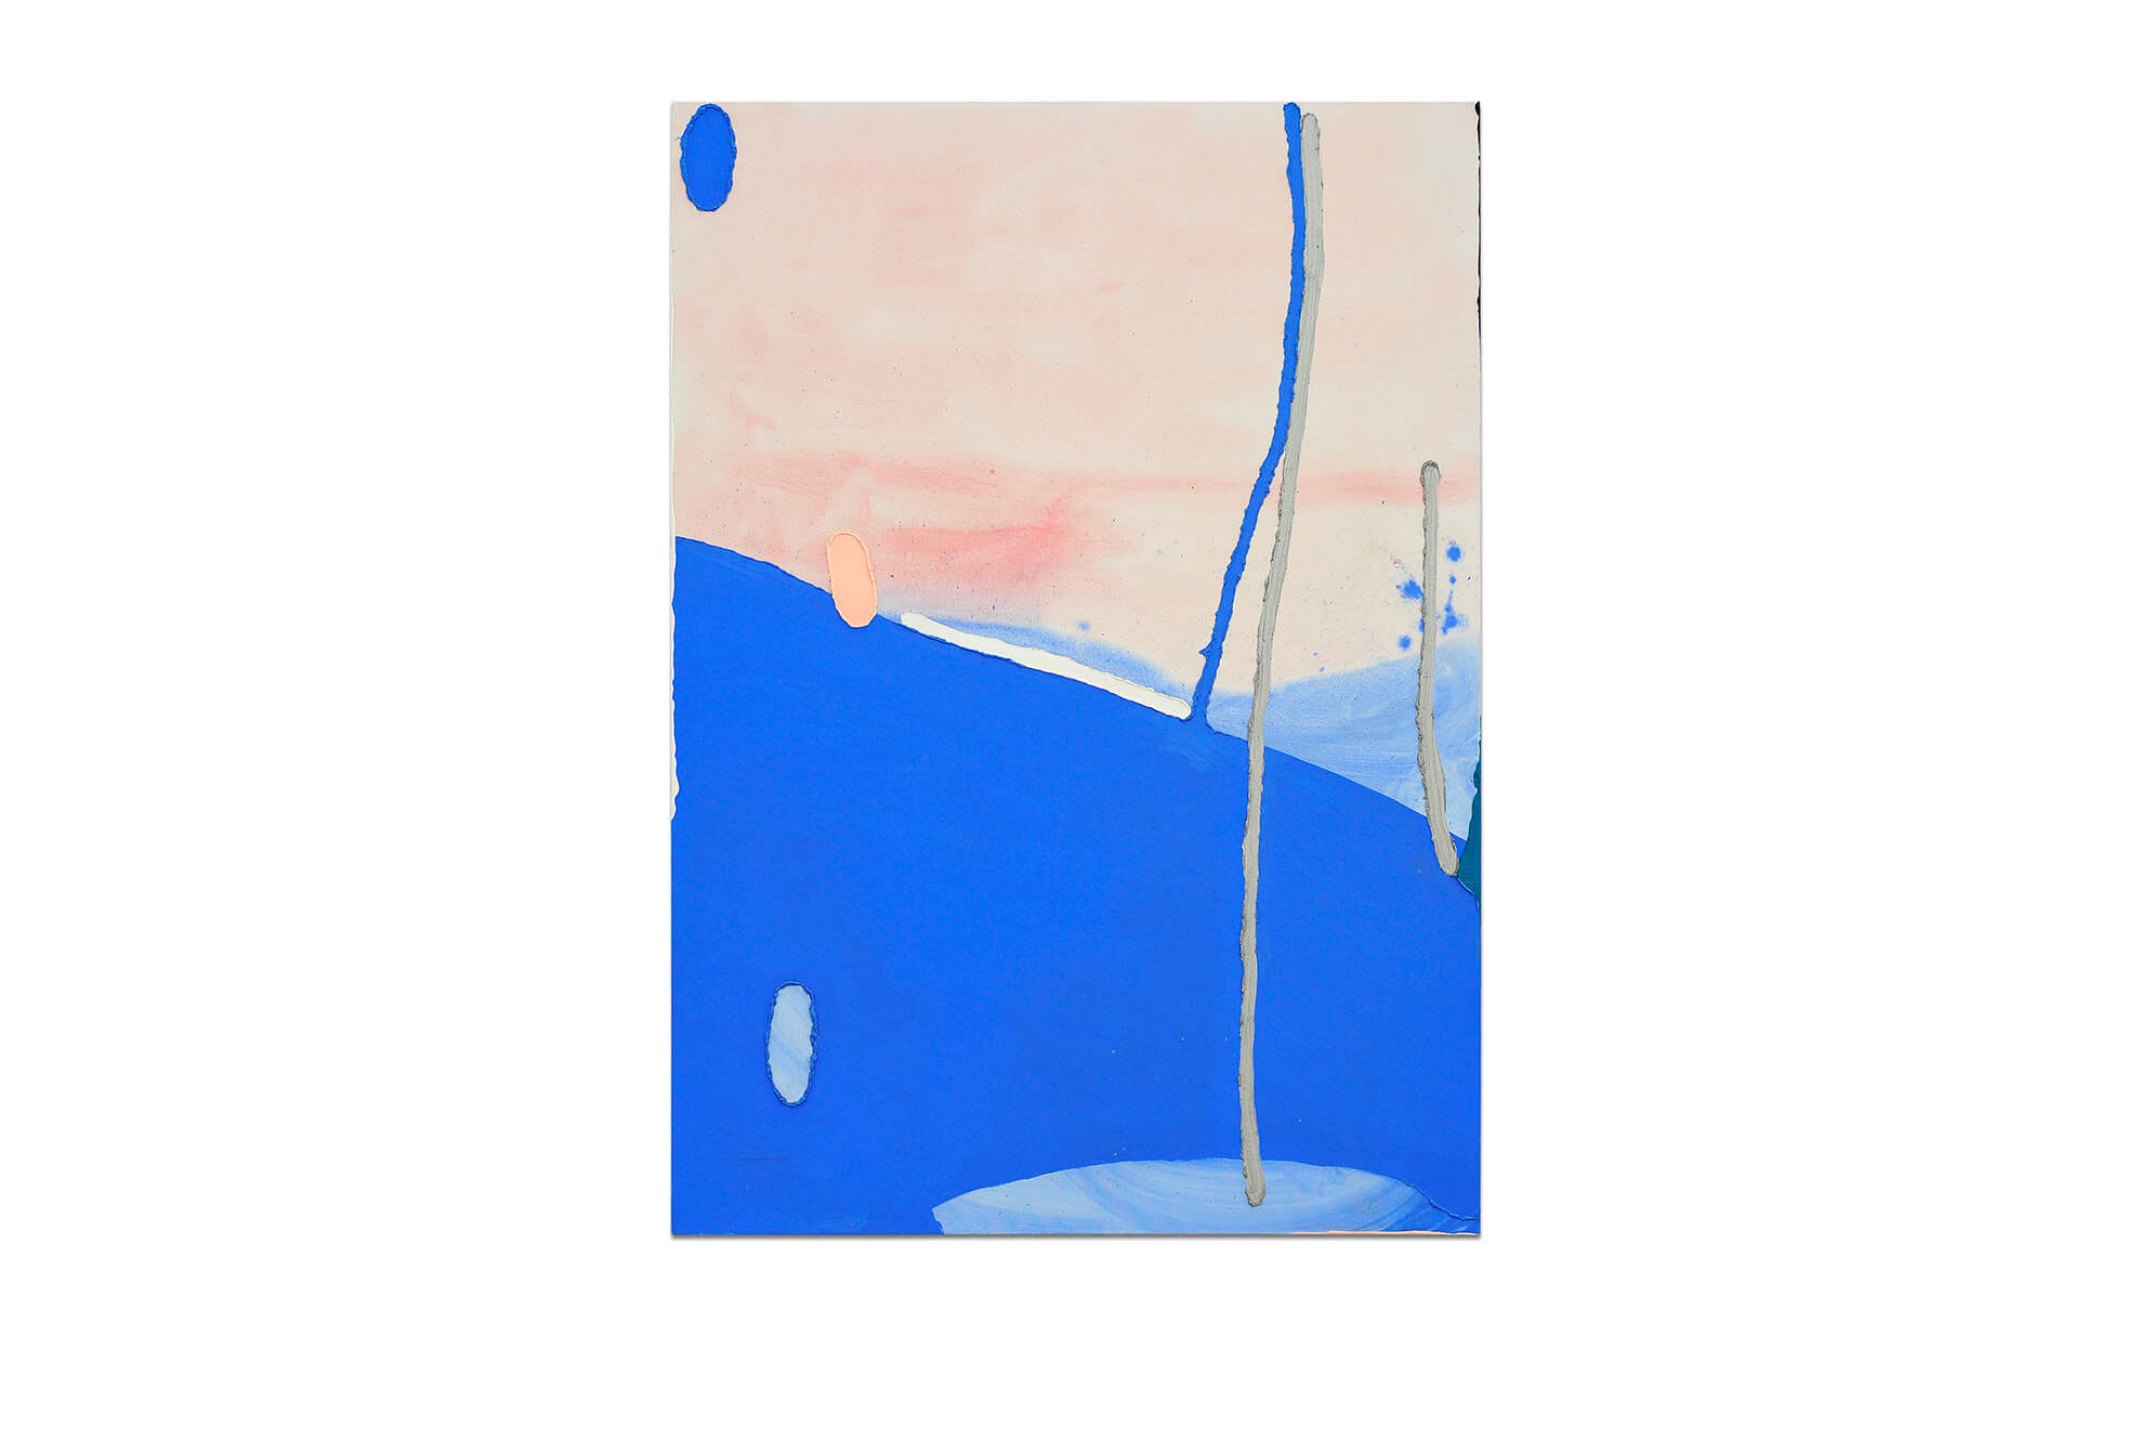 Paulo Monteiro, <em>untitled</em>, 2012, oil on canvas, 120× 80 cm - Mendes Wood DM